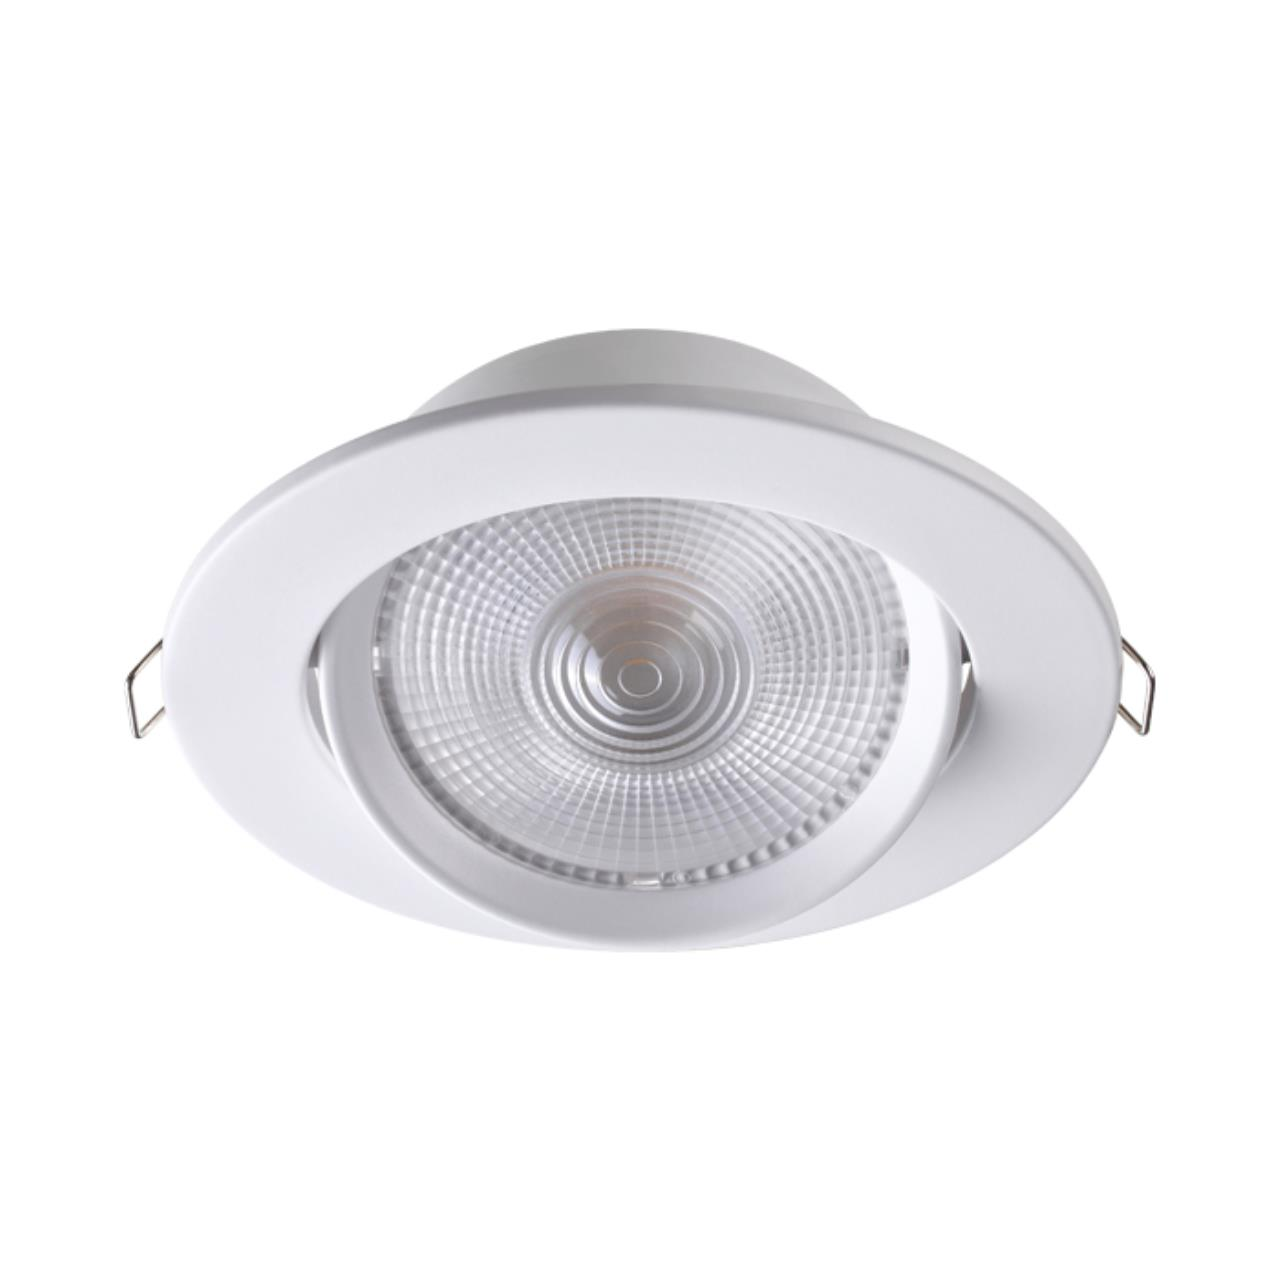 357999 SPOT NT19 091 белый Встраиваемый поворотный светильник IP20 LED 3000К 15W 85-265V STERN